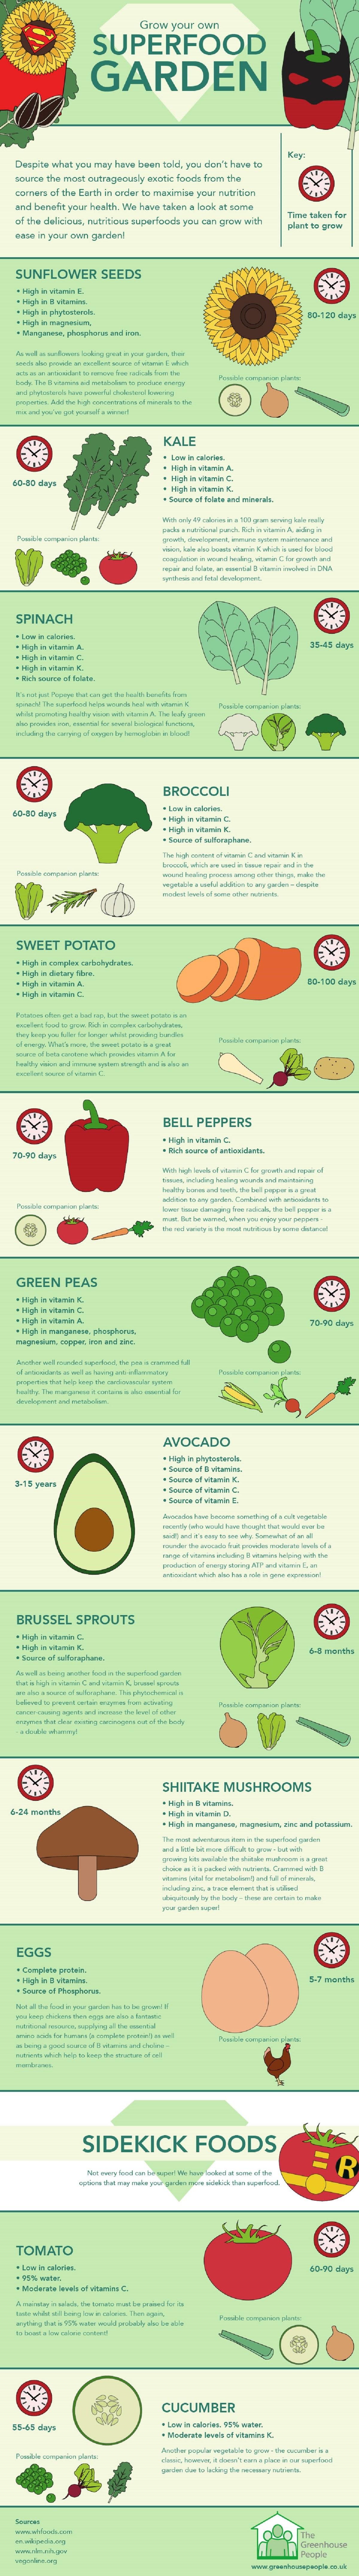 superfood-garden-infographic